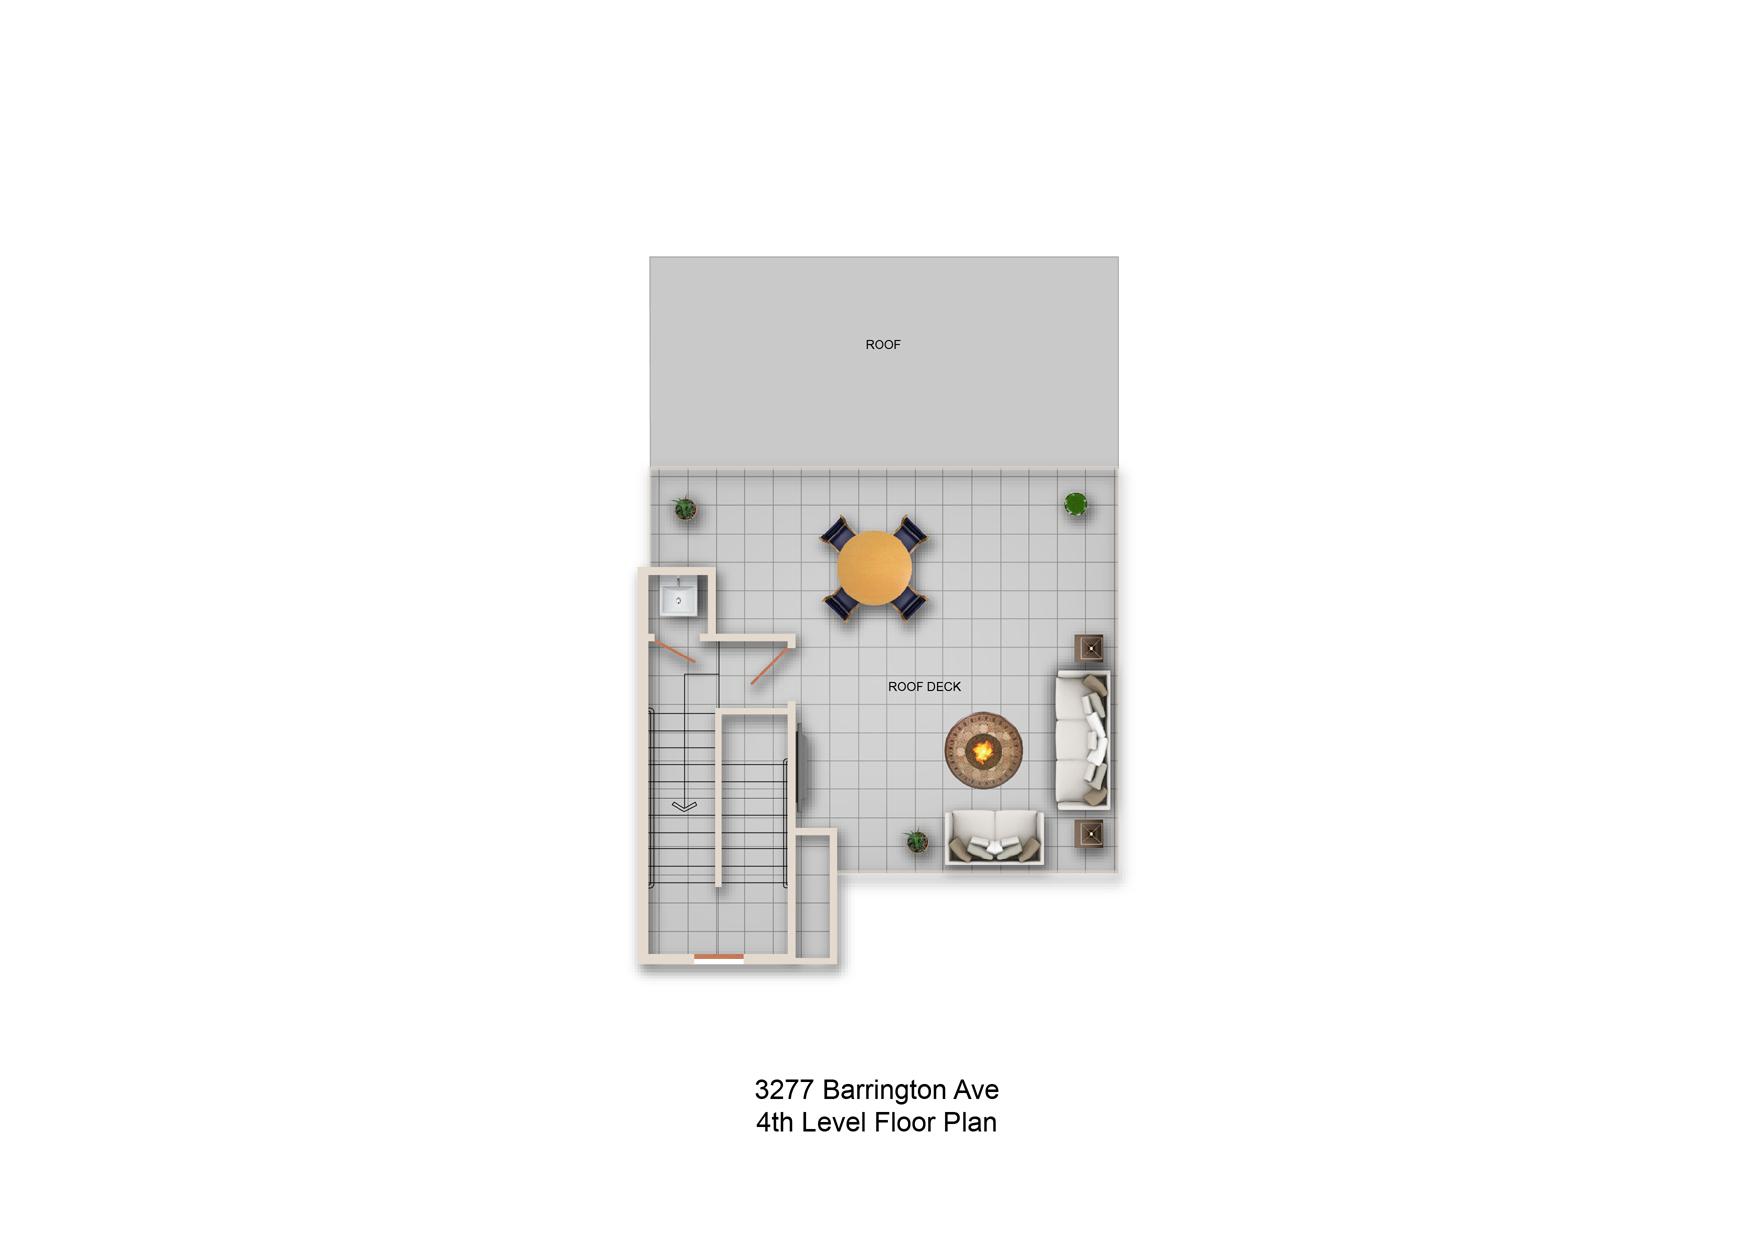 3277-Barrington-Ave-4th-Level-Floor-Plan-Web.jpg